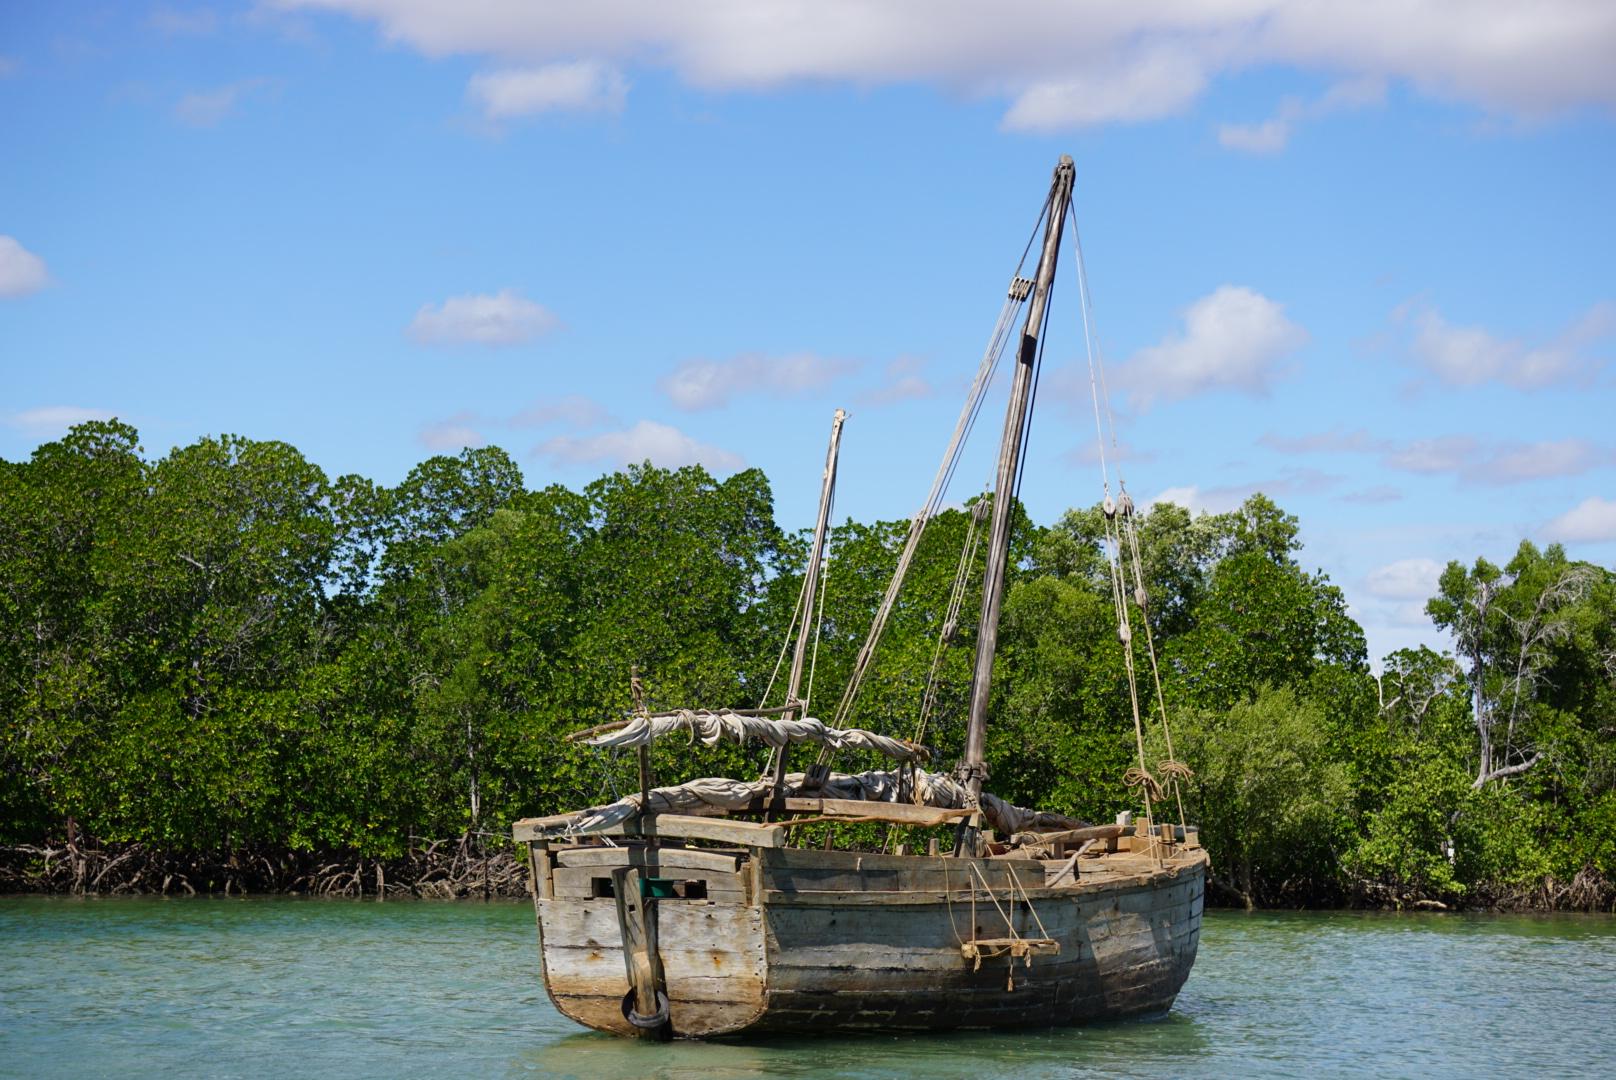 boutre malgache dans mangrove